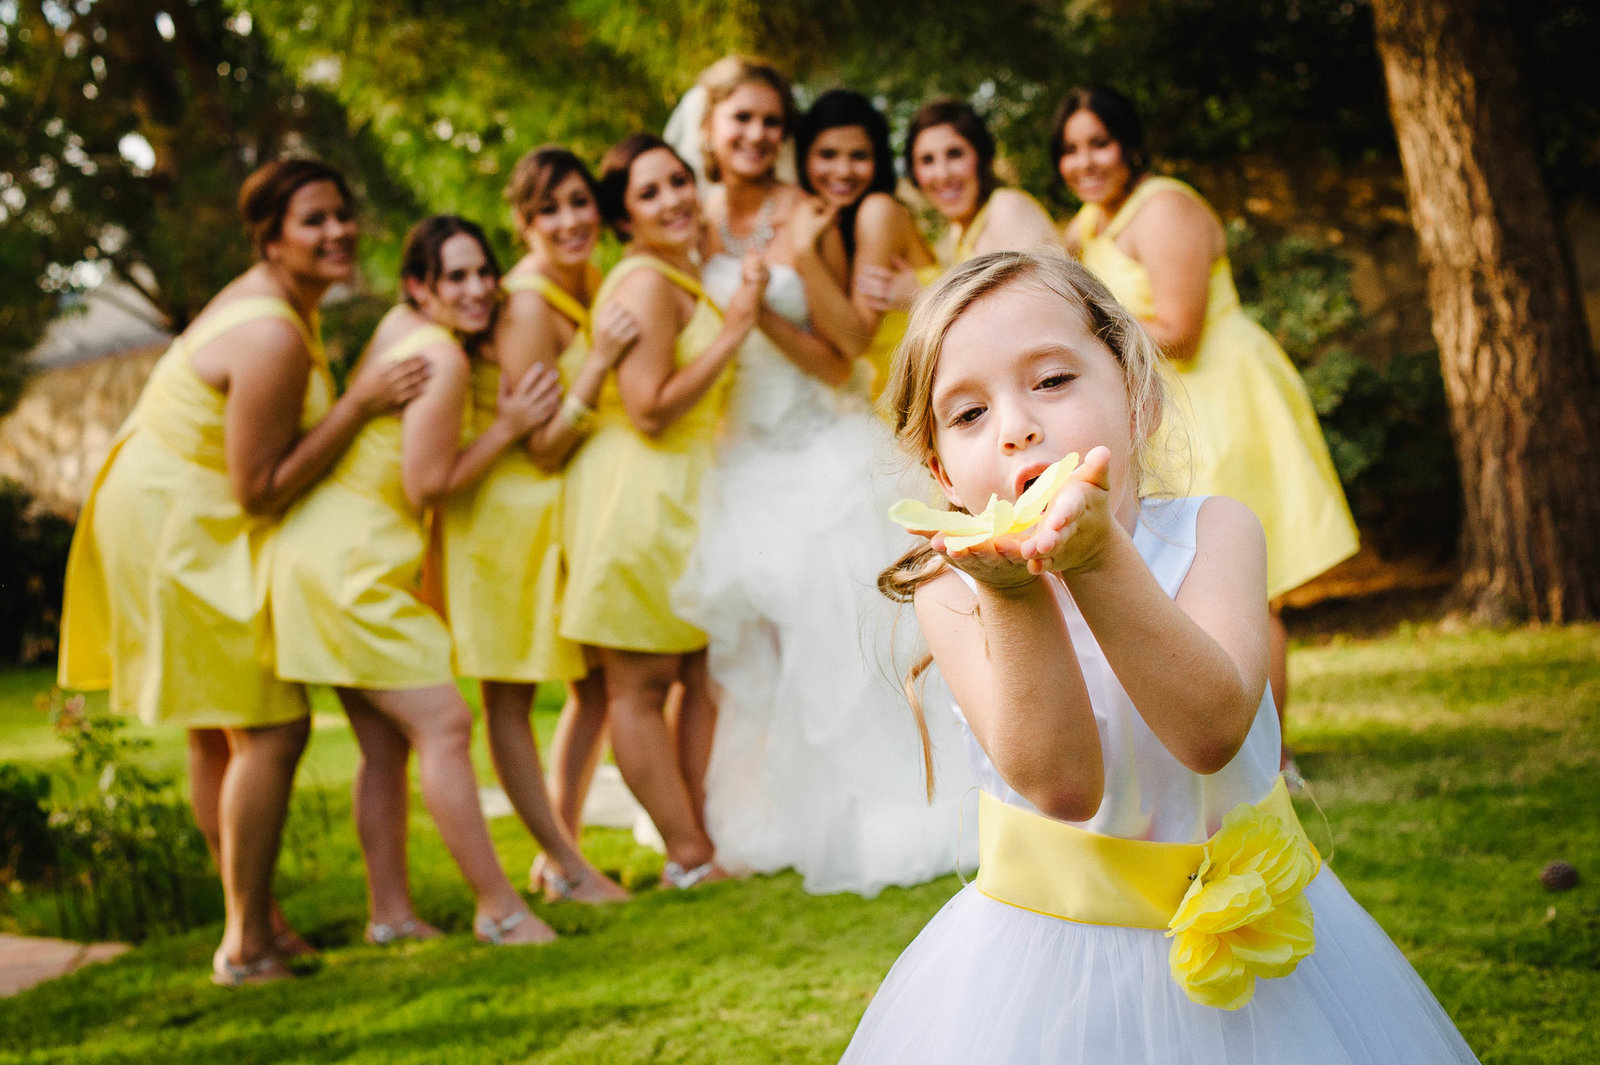 207-El-paso-wedding-photographer-El Paso Wedding Photographer_M10